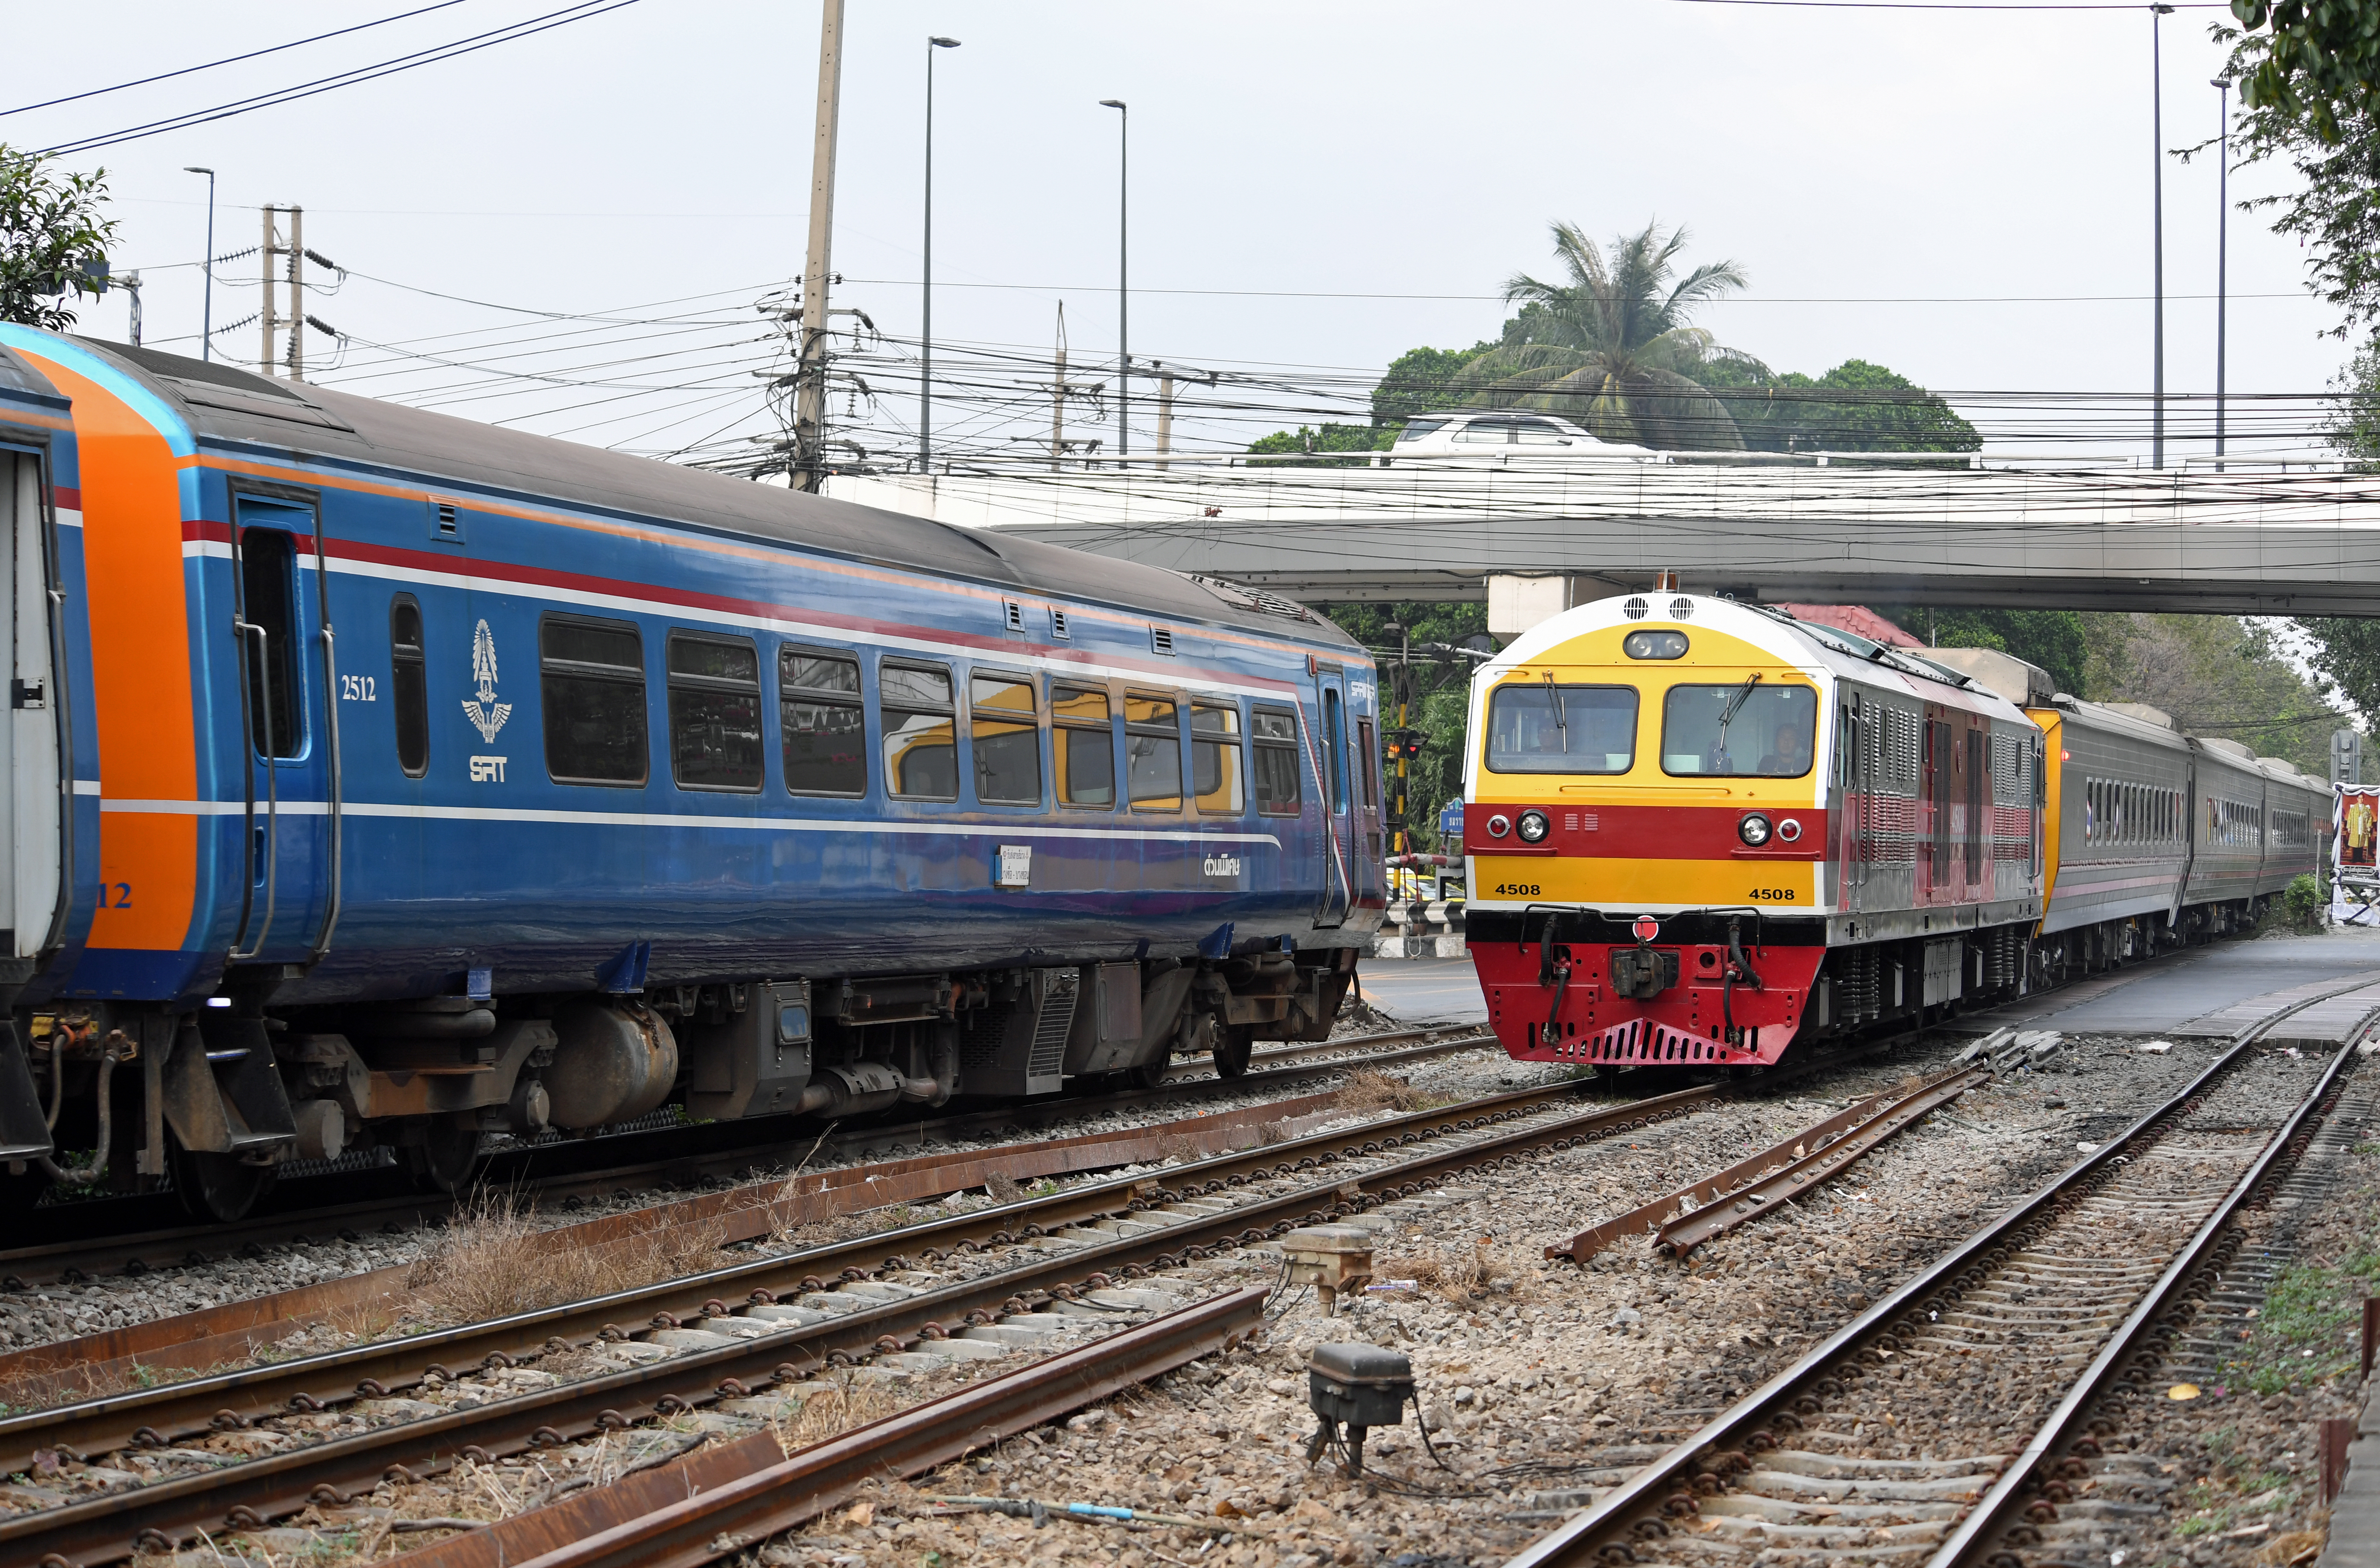 dg263948-2512-4508-yommarat-jn-bangkok-thailand-2-2-17